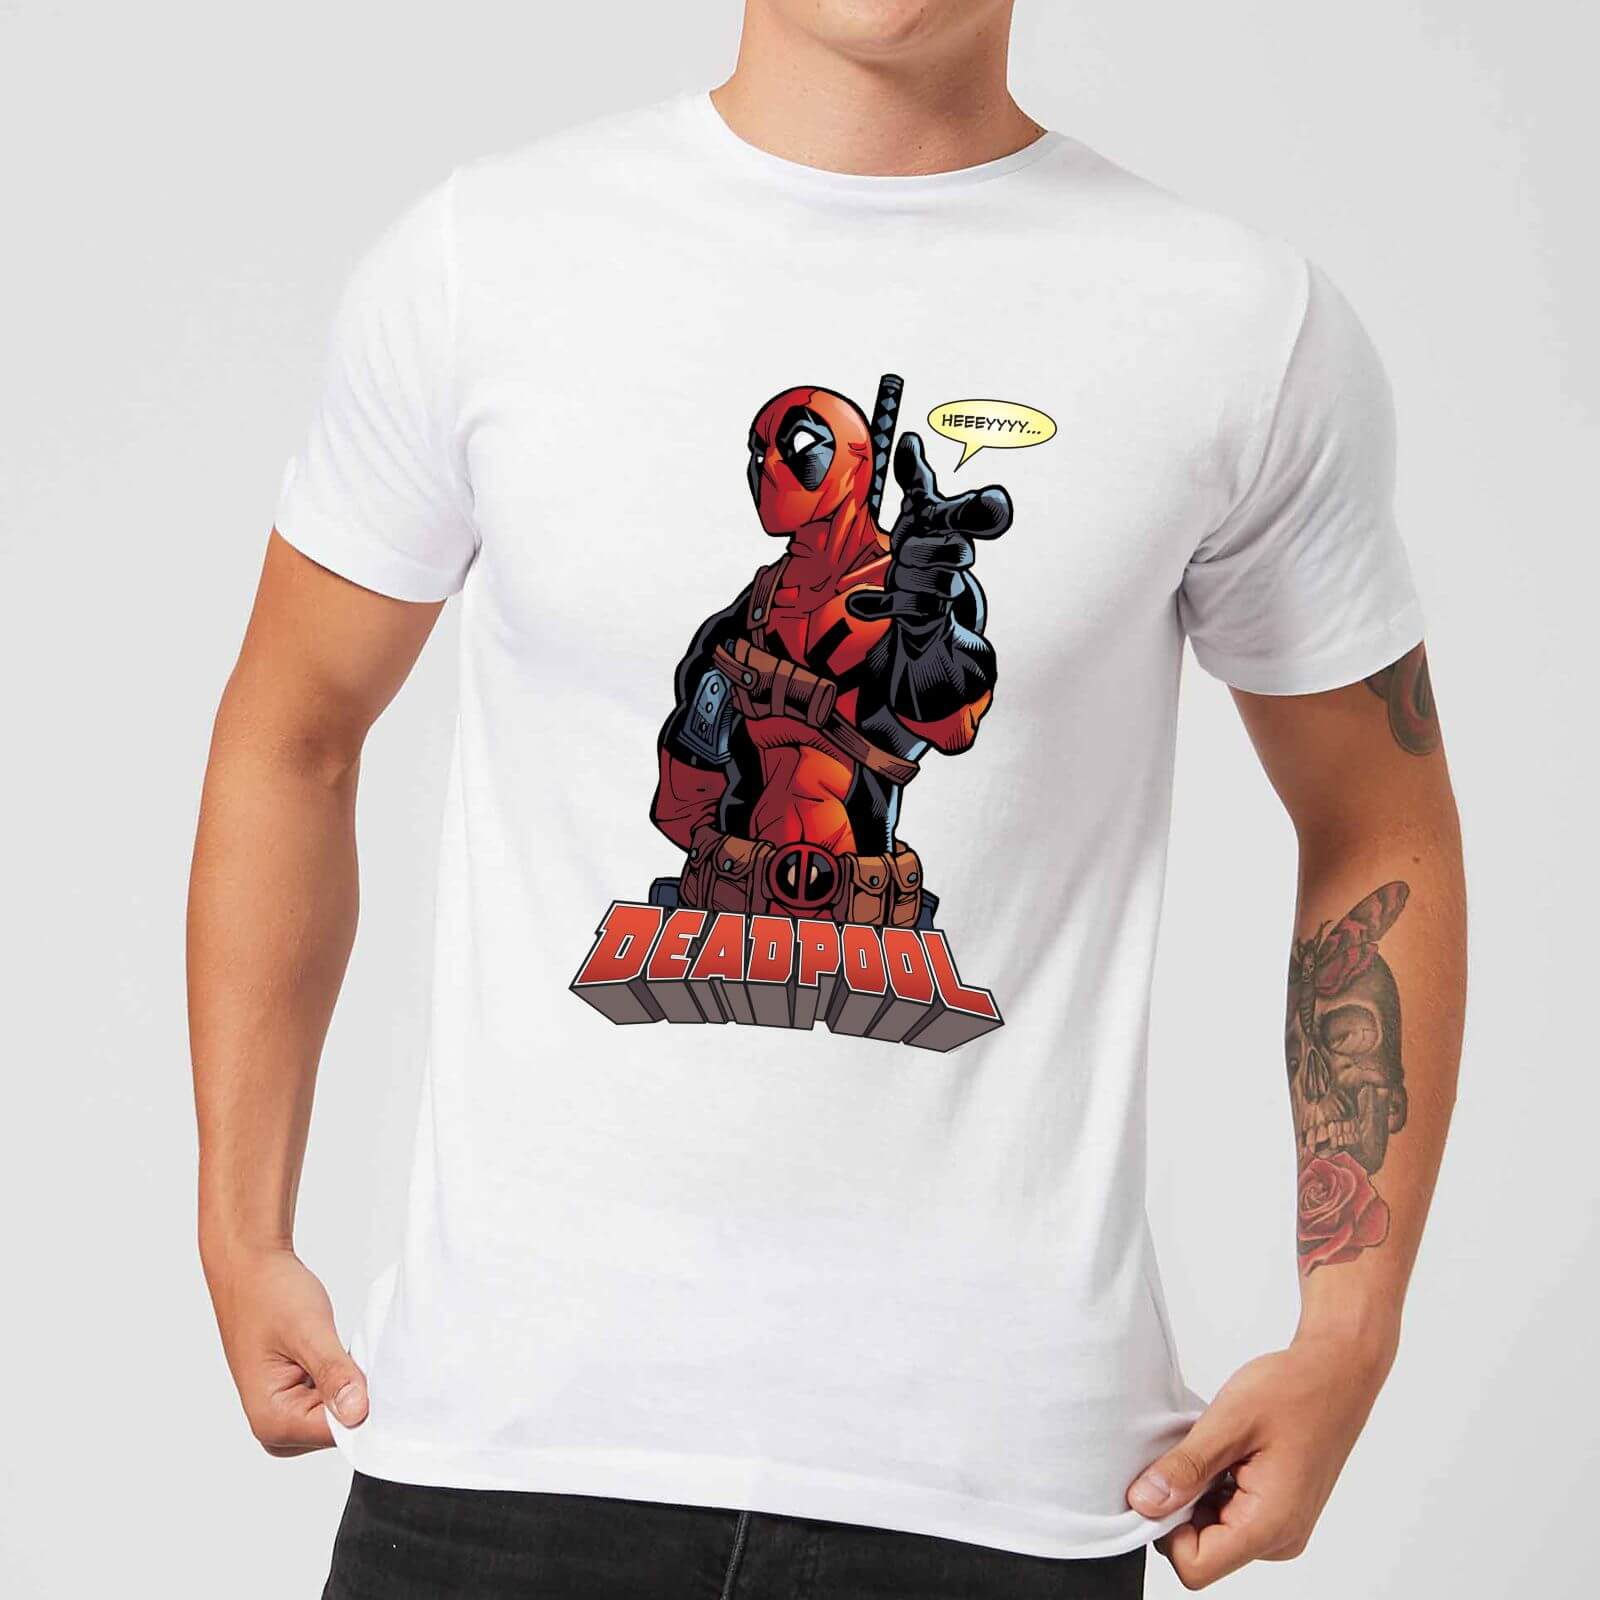 OfferteWeb.click 21-t-shirt-marvel-deadpool-hey-you-bianco-uomo-l-bianco